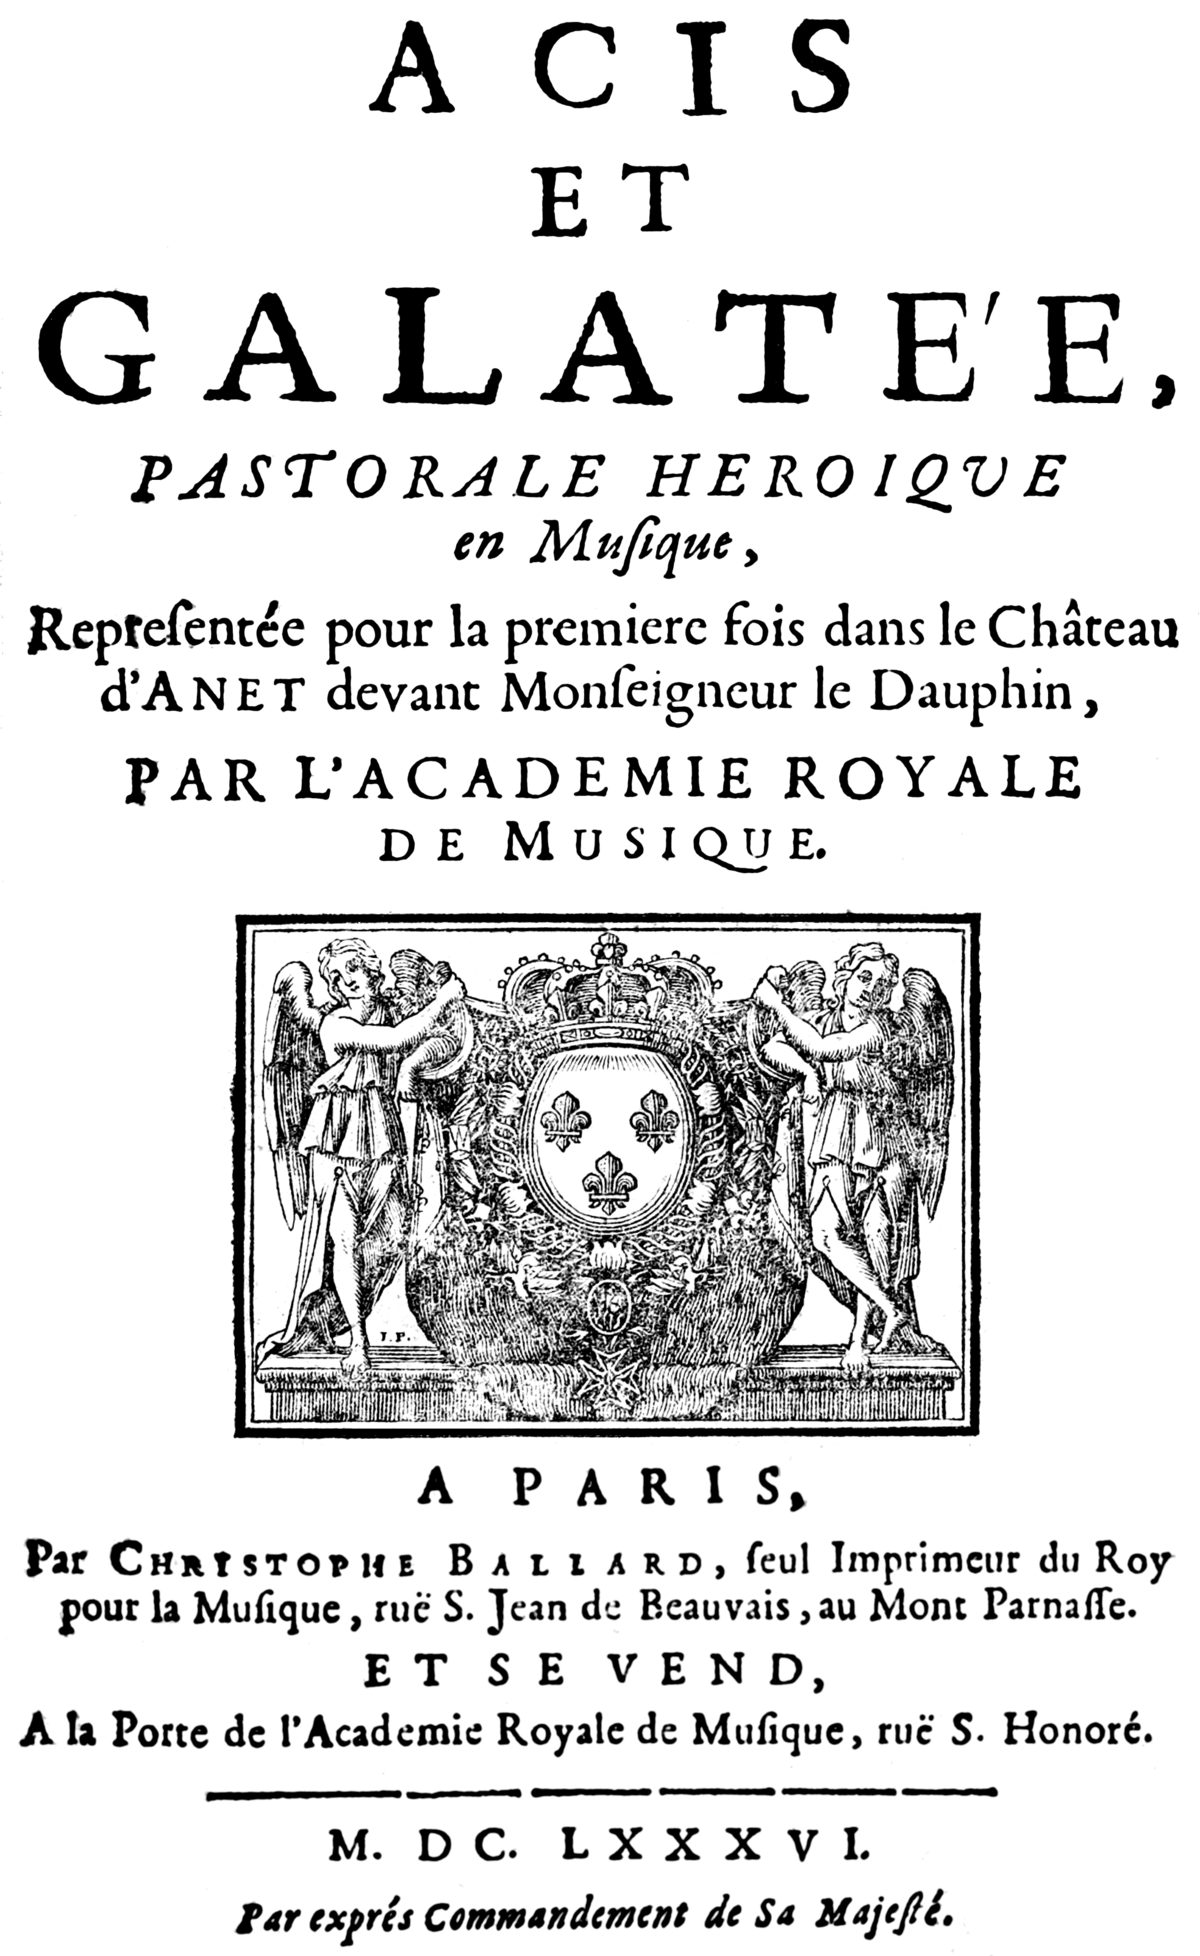 Acis et Galatée – Wikipedia